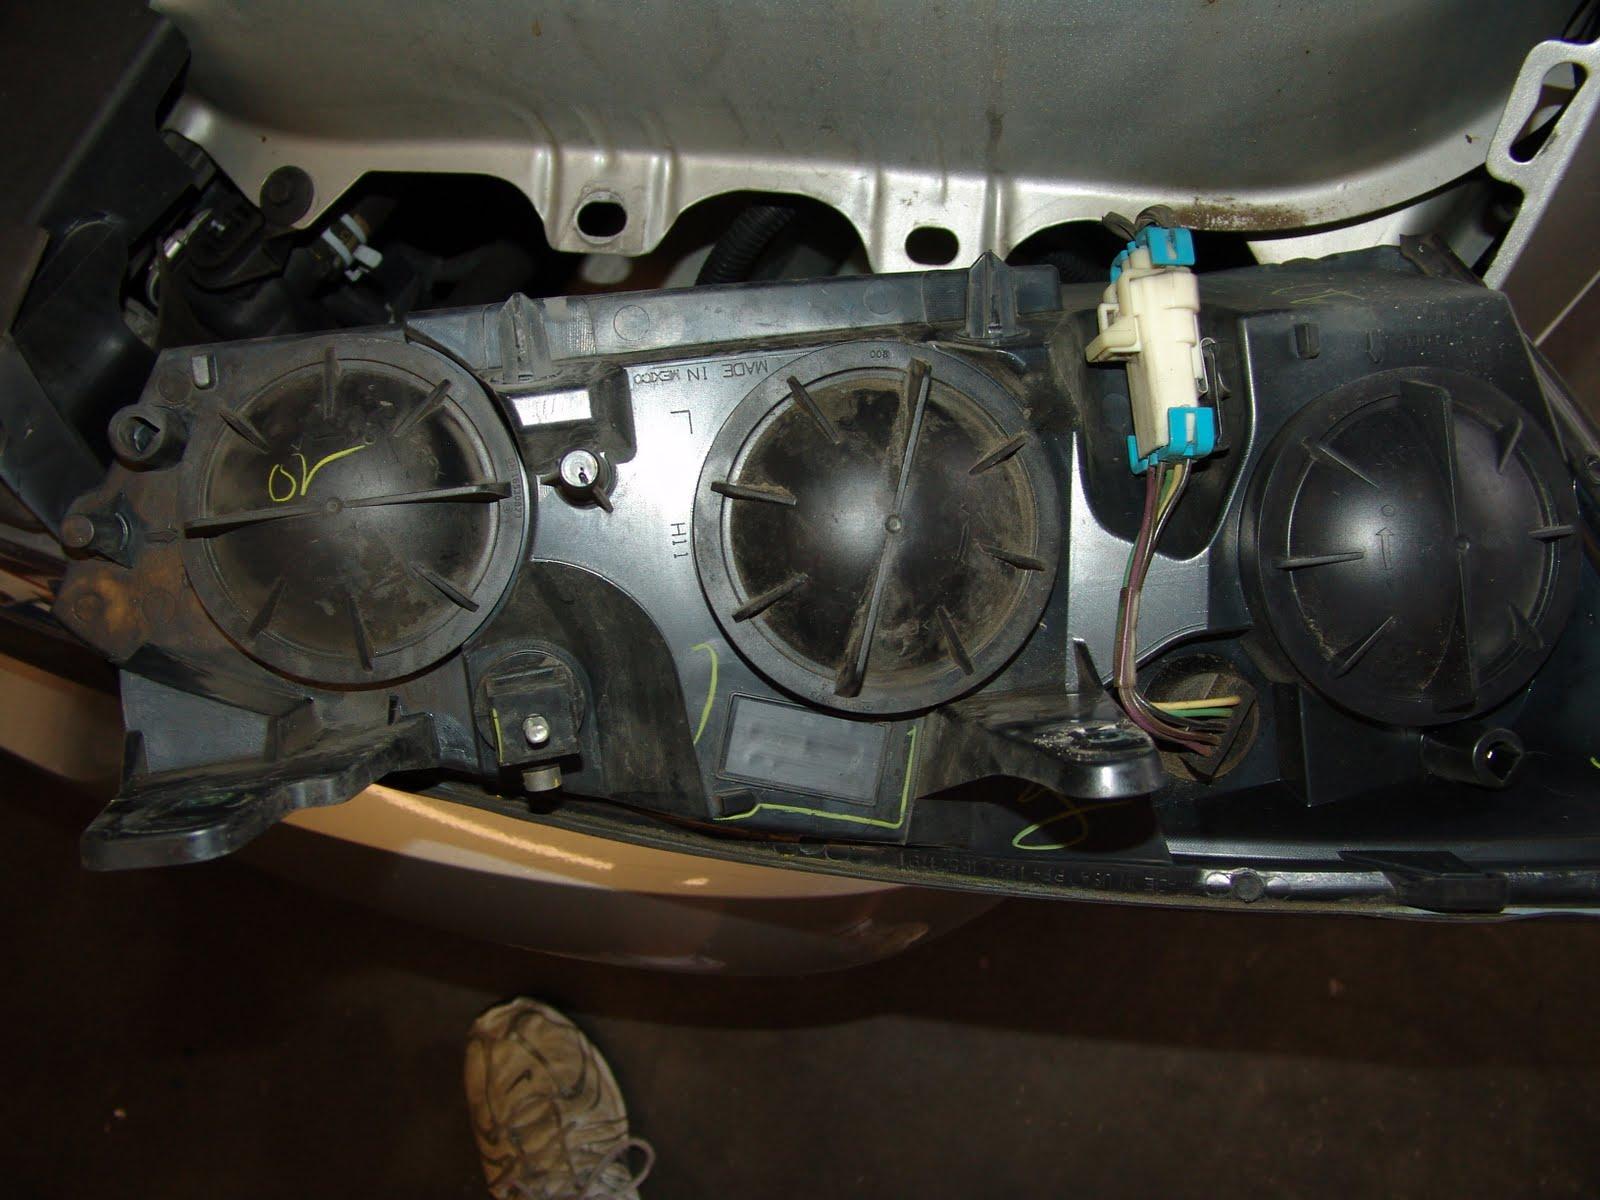 2004 Pontiac Gto Tail Lights Wiring Diagram Will Be 1967 Fuse Box Headlight Harness 2007 Chevy Malibu Get 2006